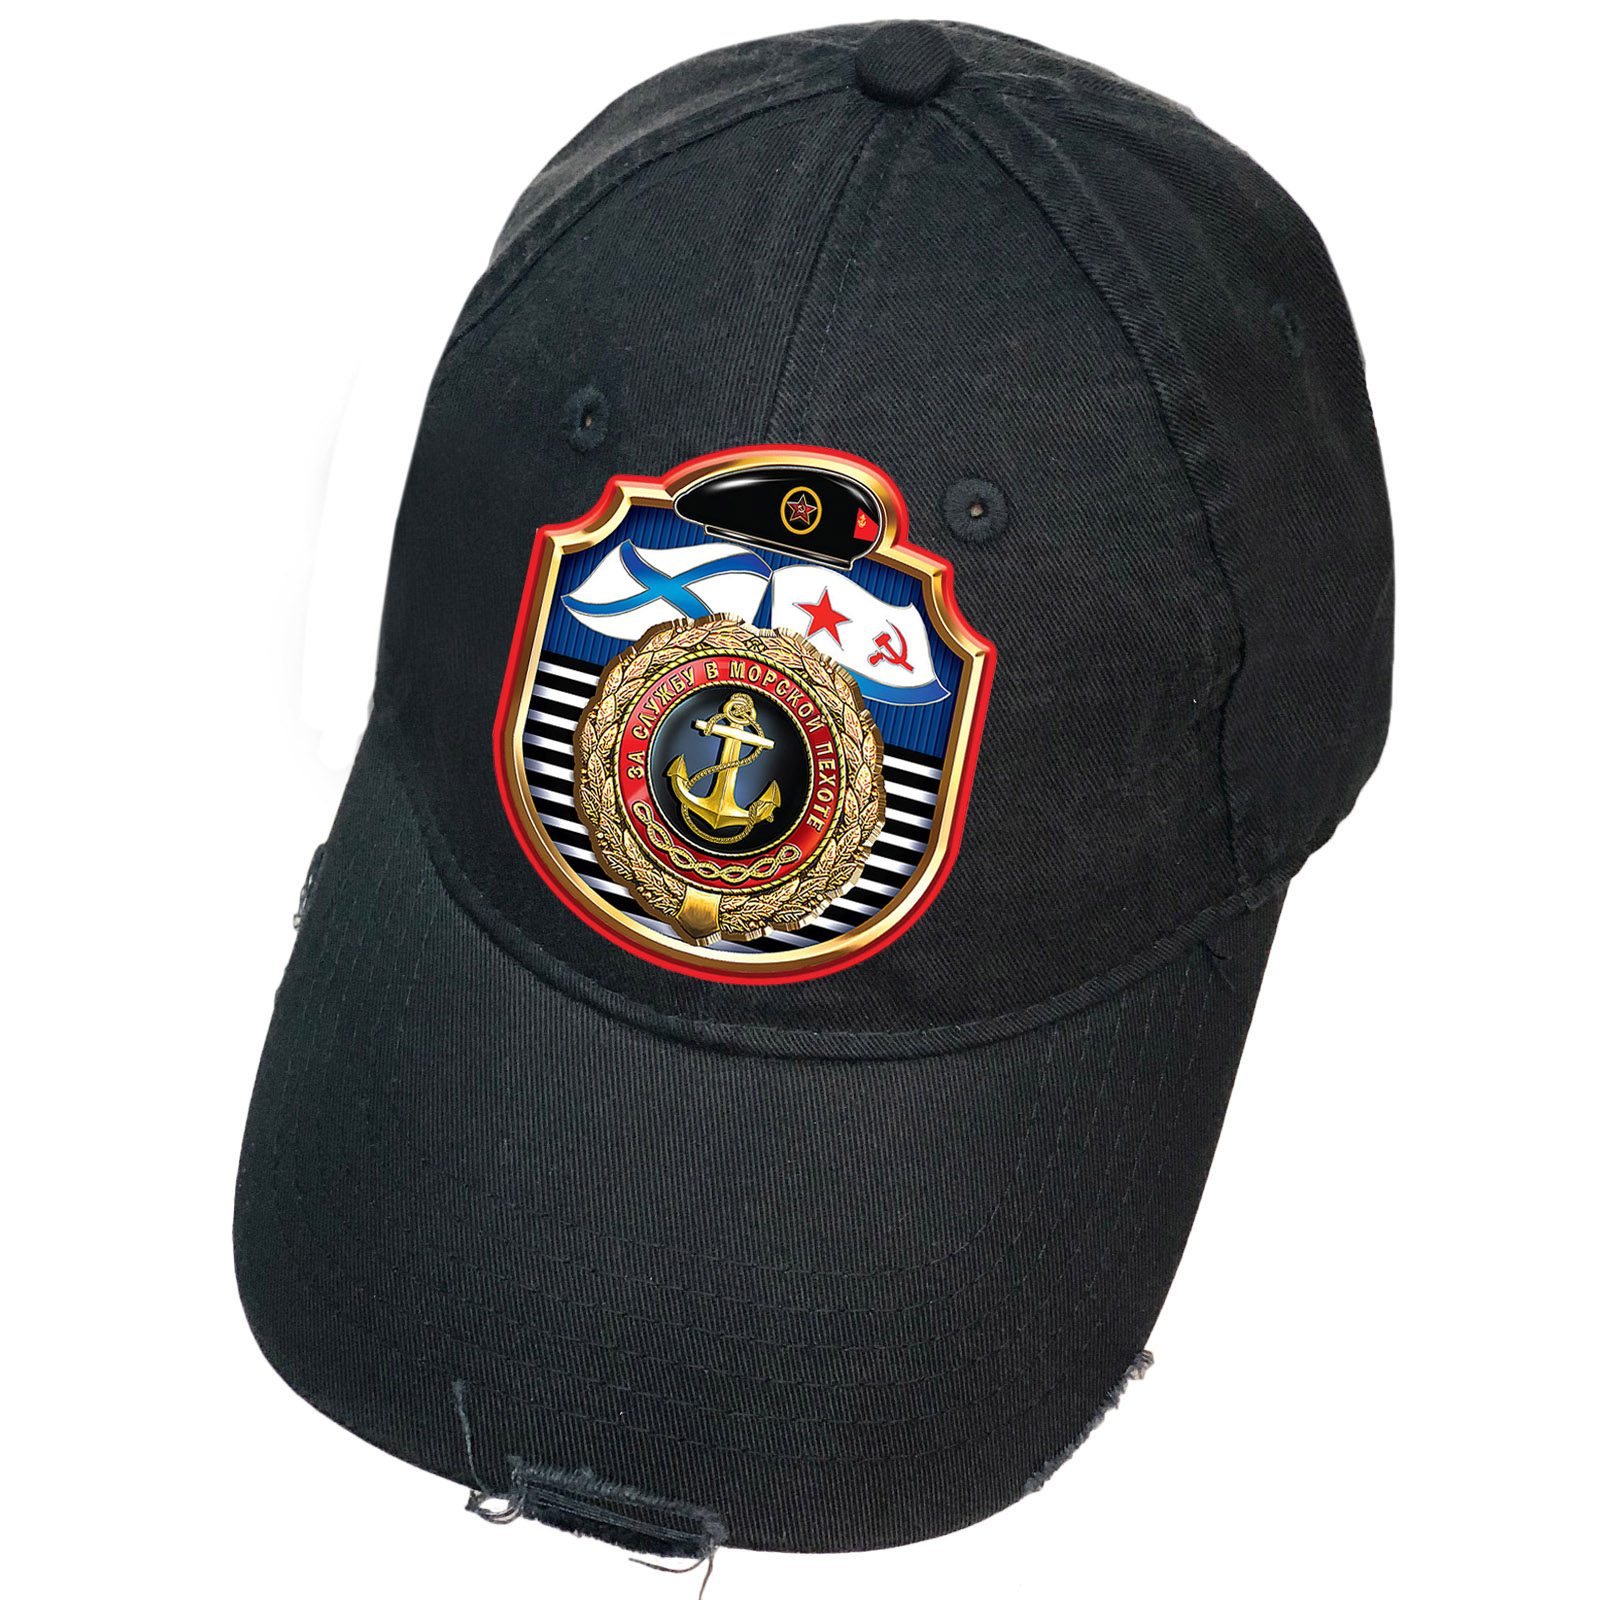 Чёрная кепка За службу в морской пехоте